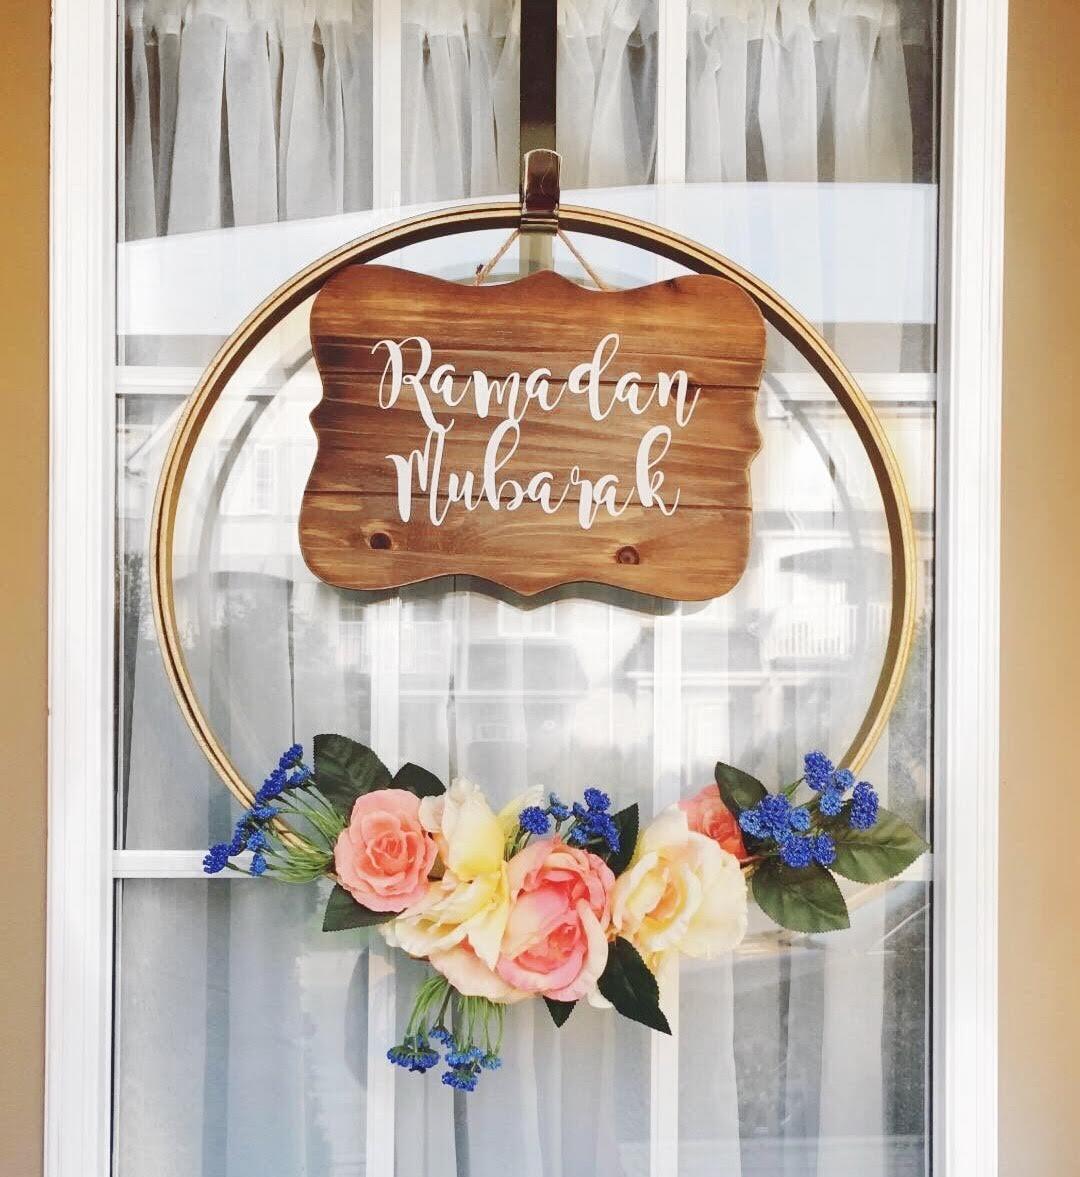 Ramadan-wreath-decor-idea